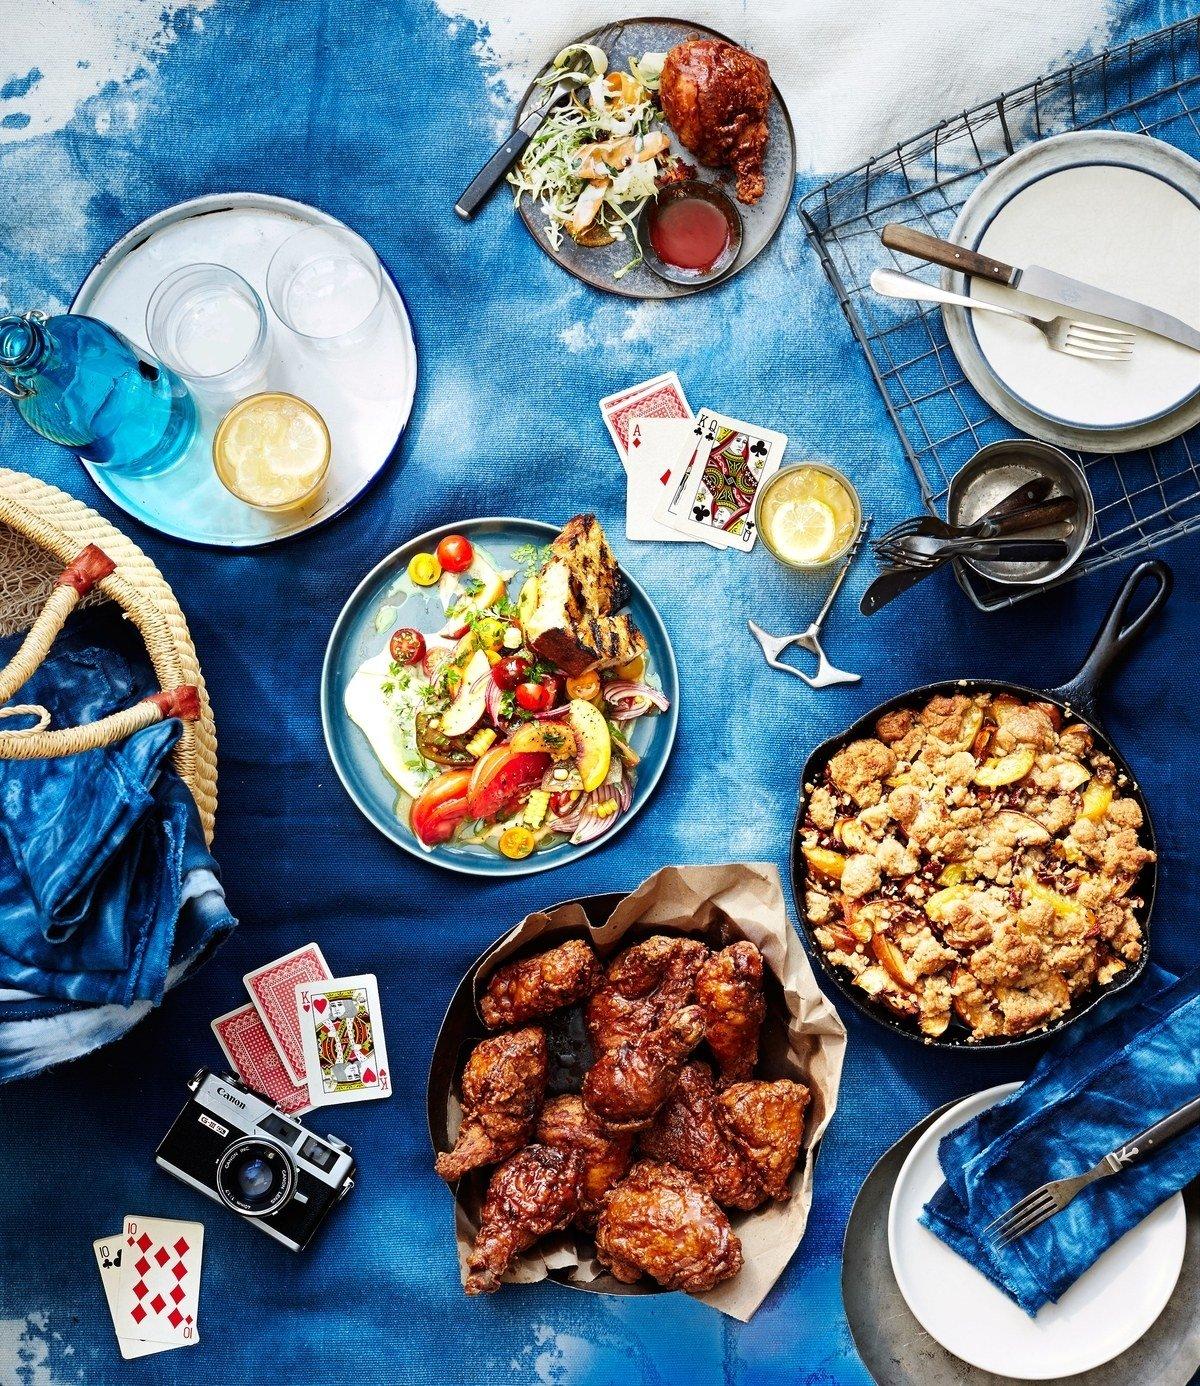 10 Perfect Fourth Of July Picnic Ideas the ultimate july 4th picnic menu bon appetit bon appetit 1 2021